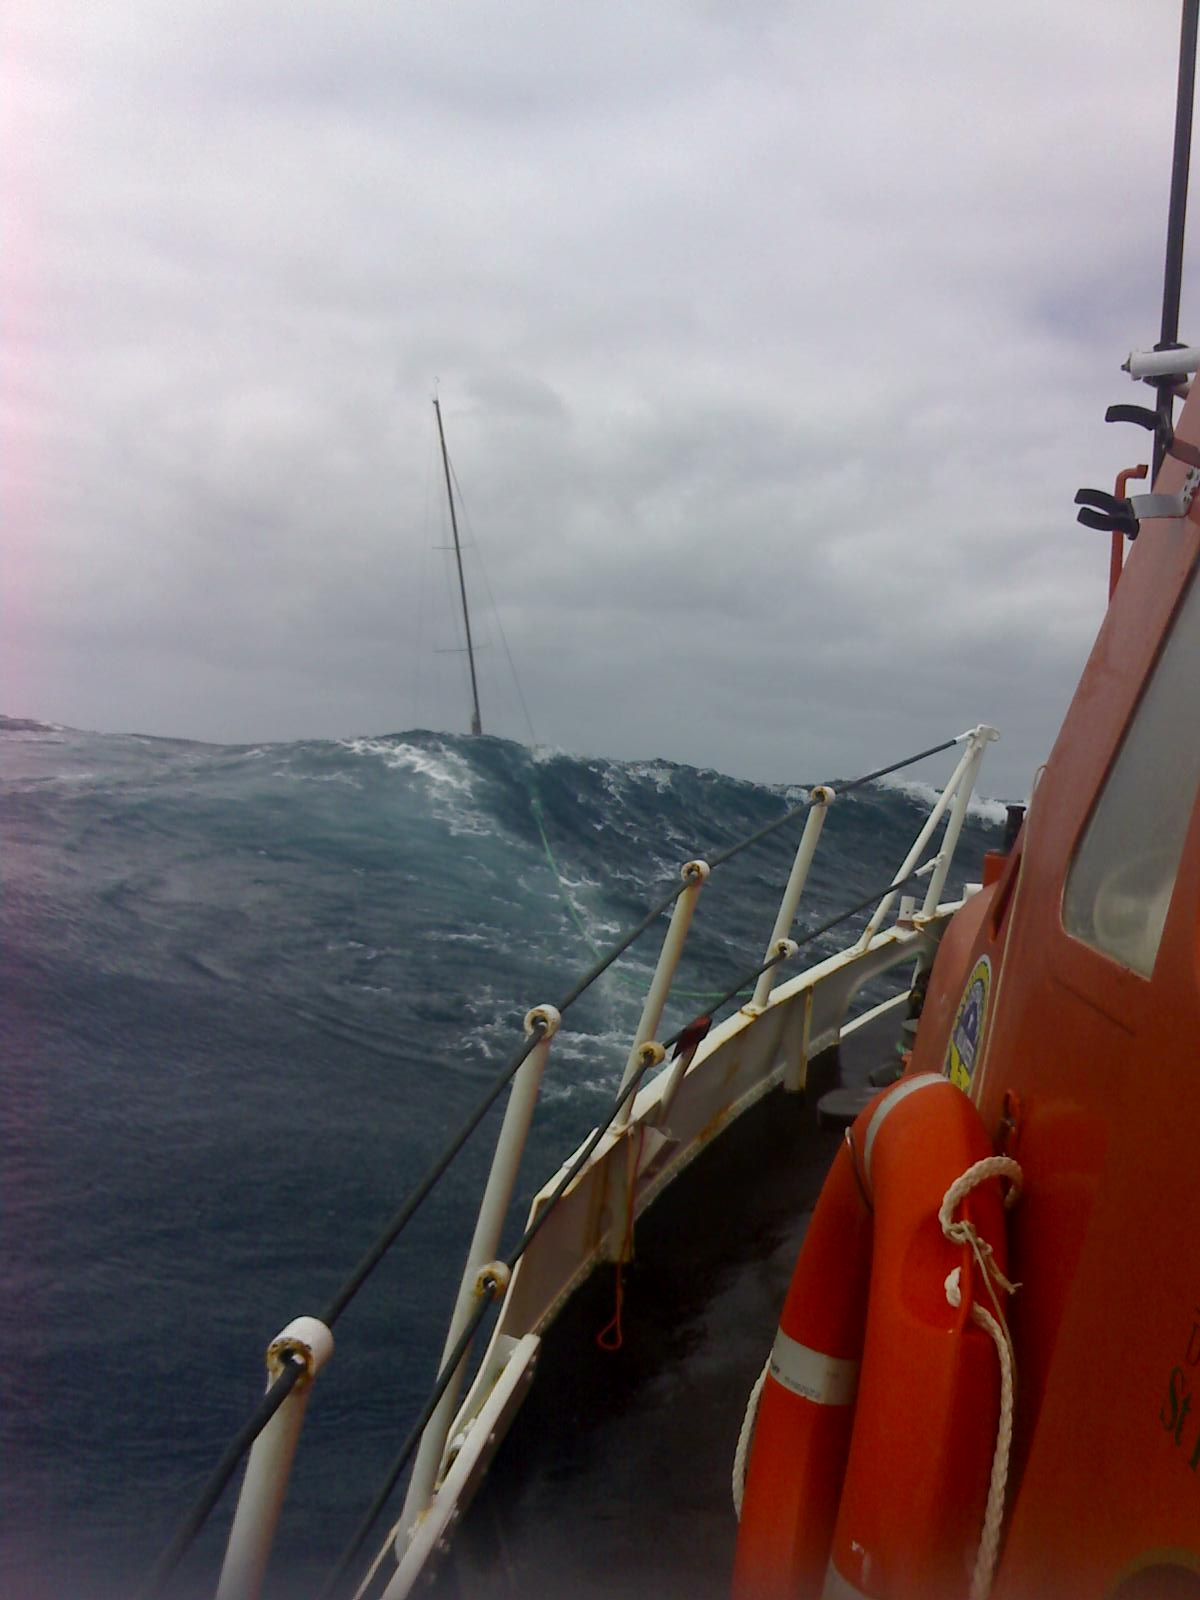 sydney hobart race maximum wave height - photo#15